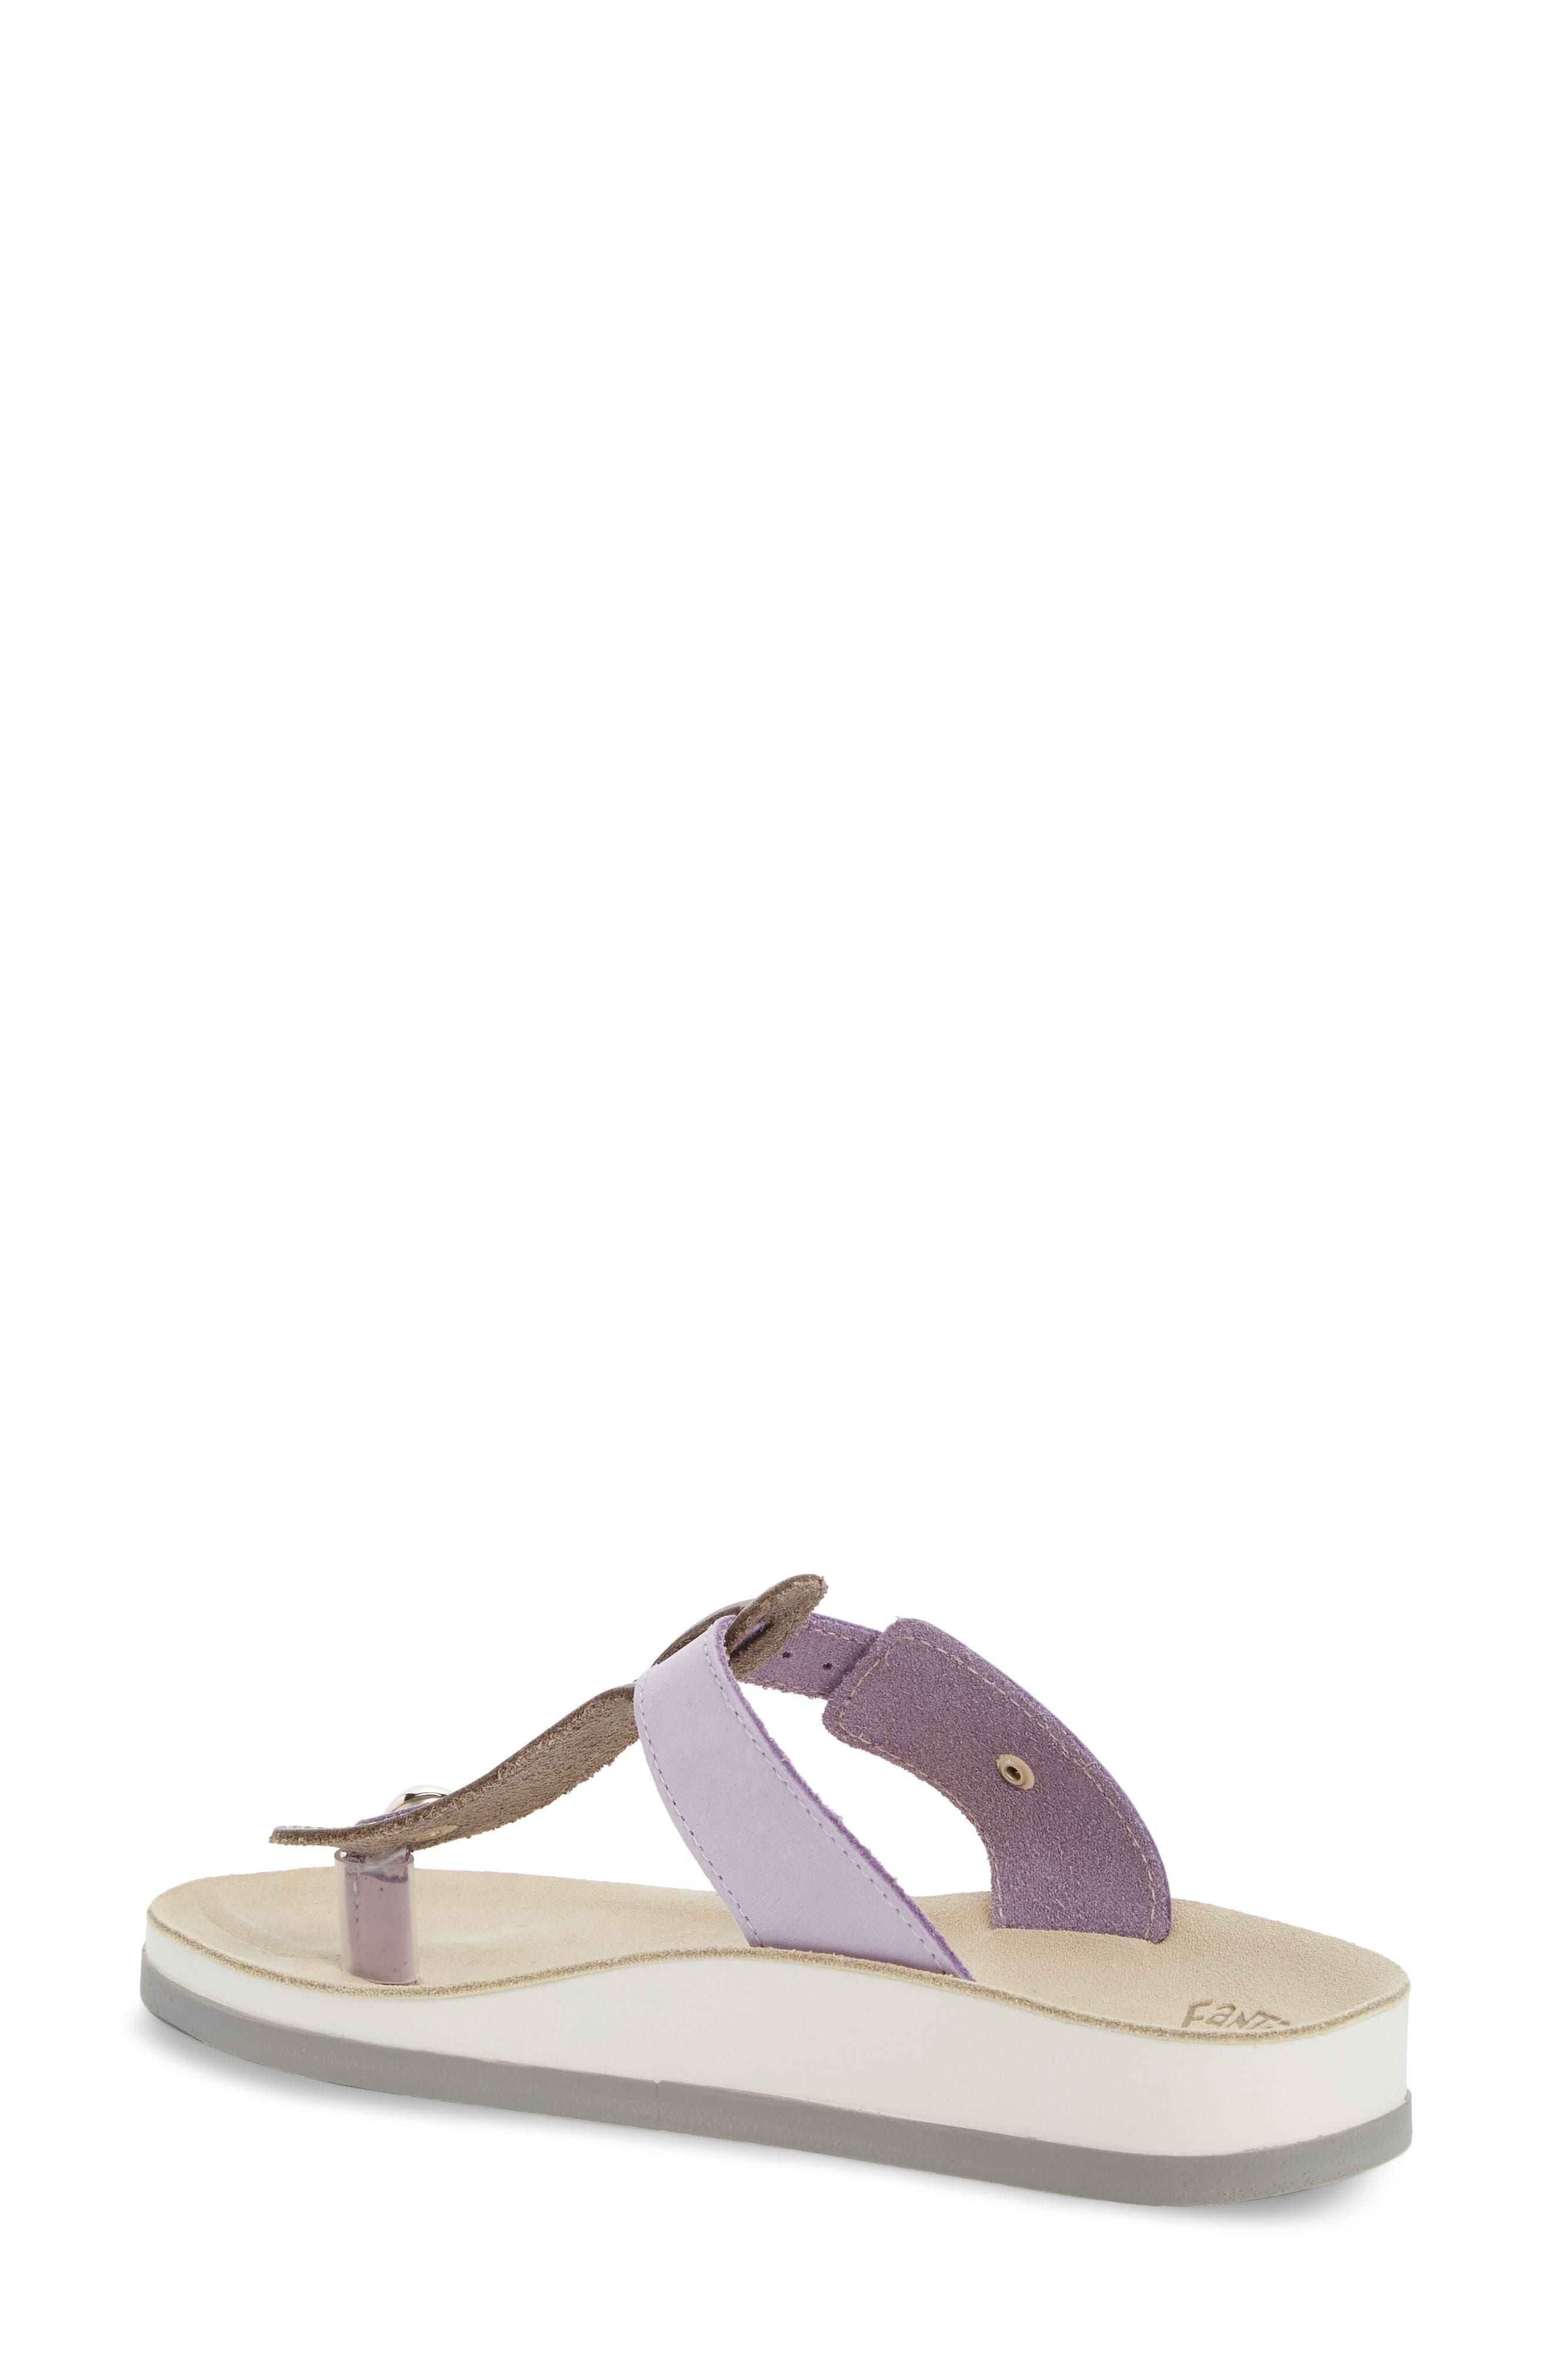 Viola Sandal,                             Alternate thumbnail 2, color,                             Lila Grey Leather